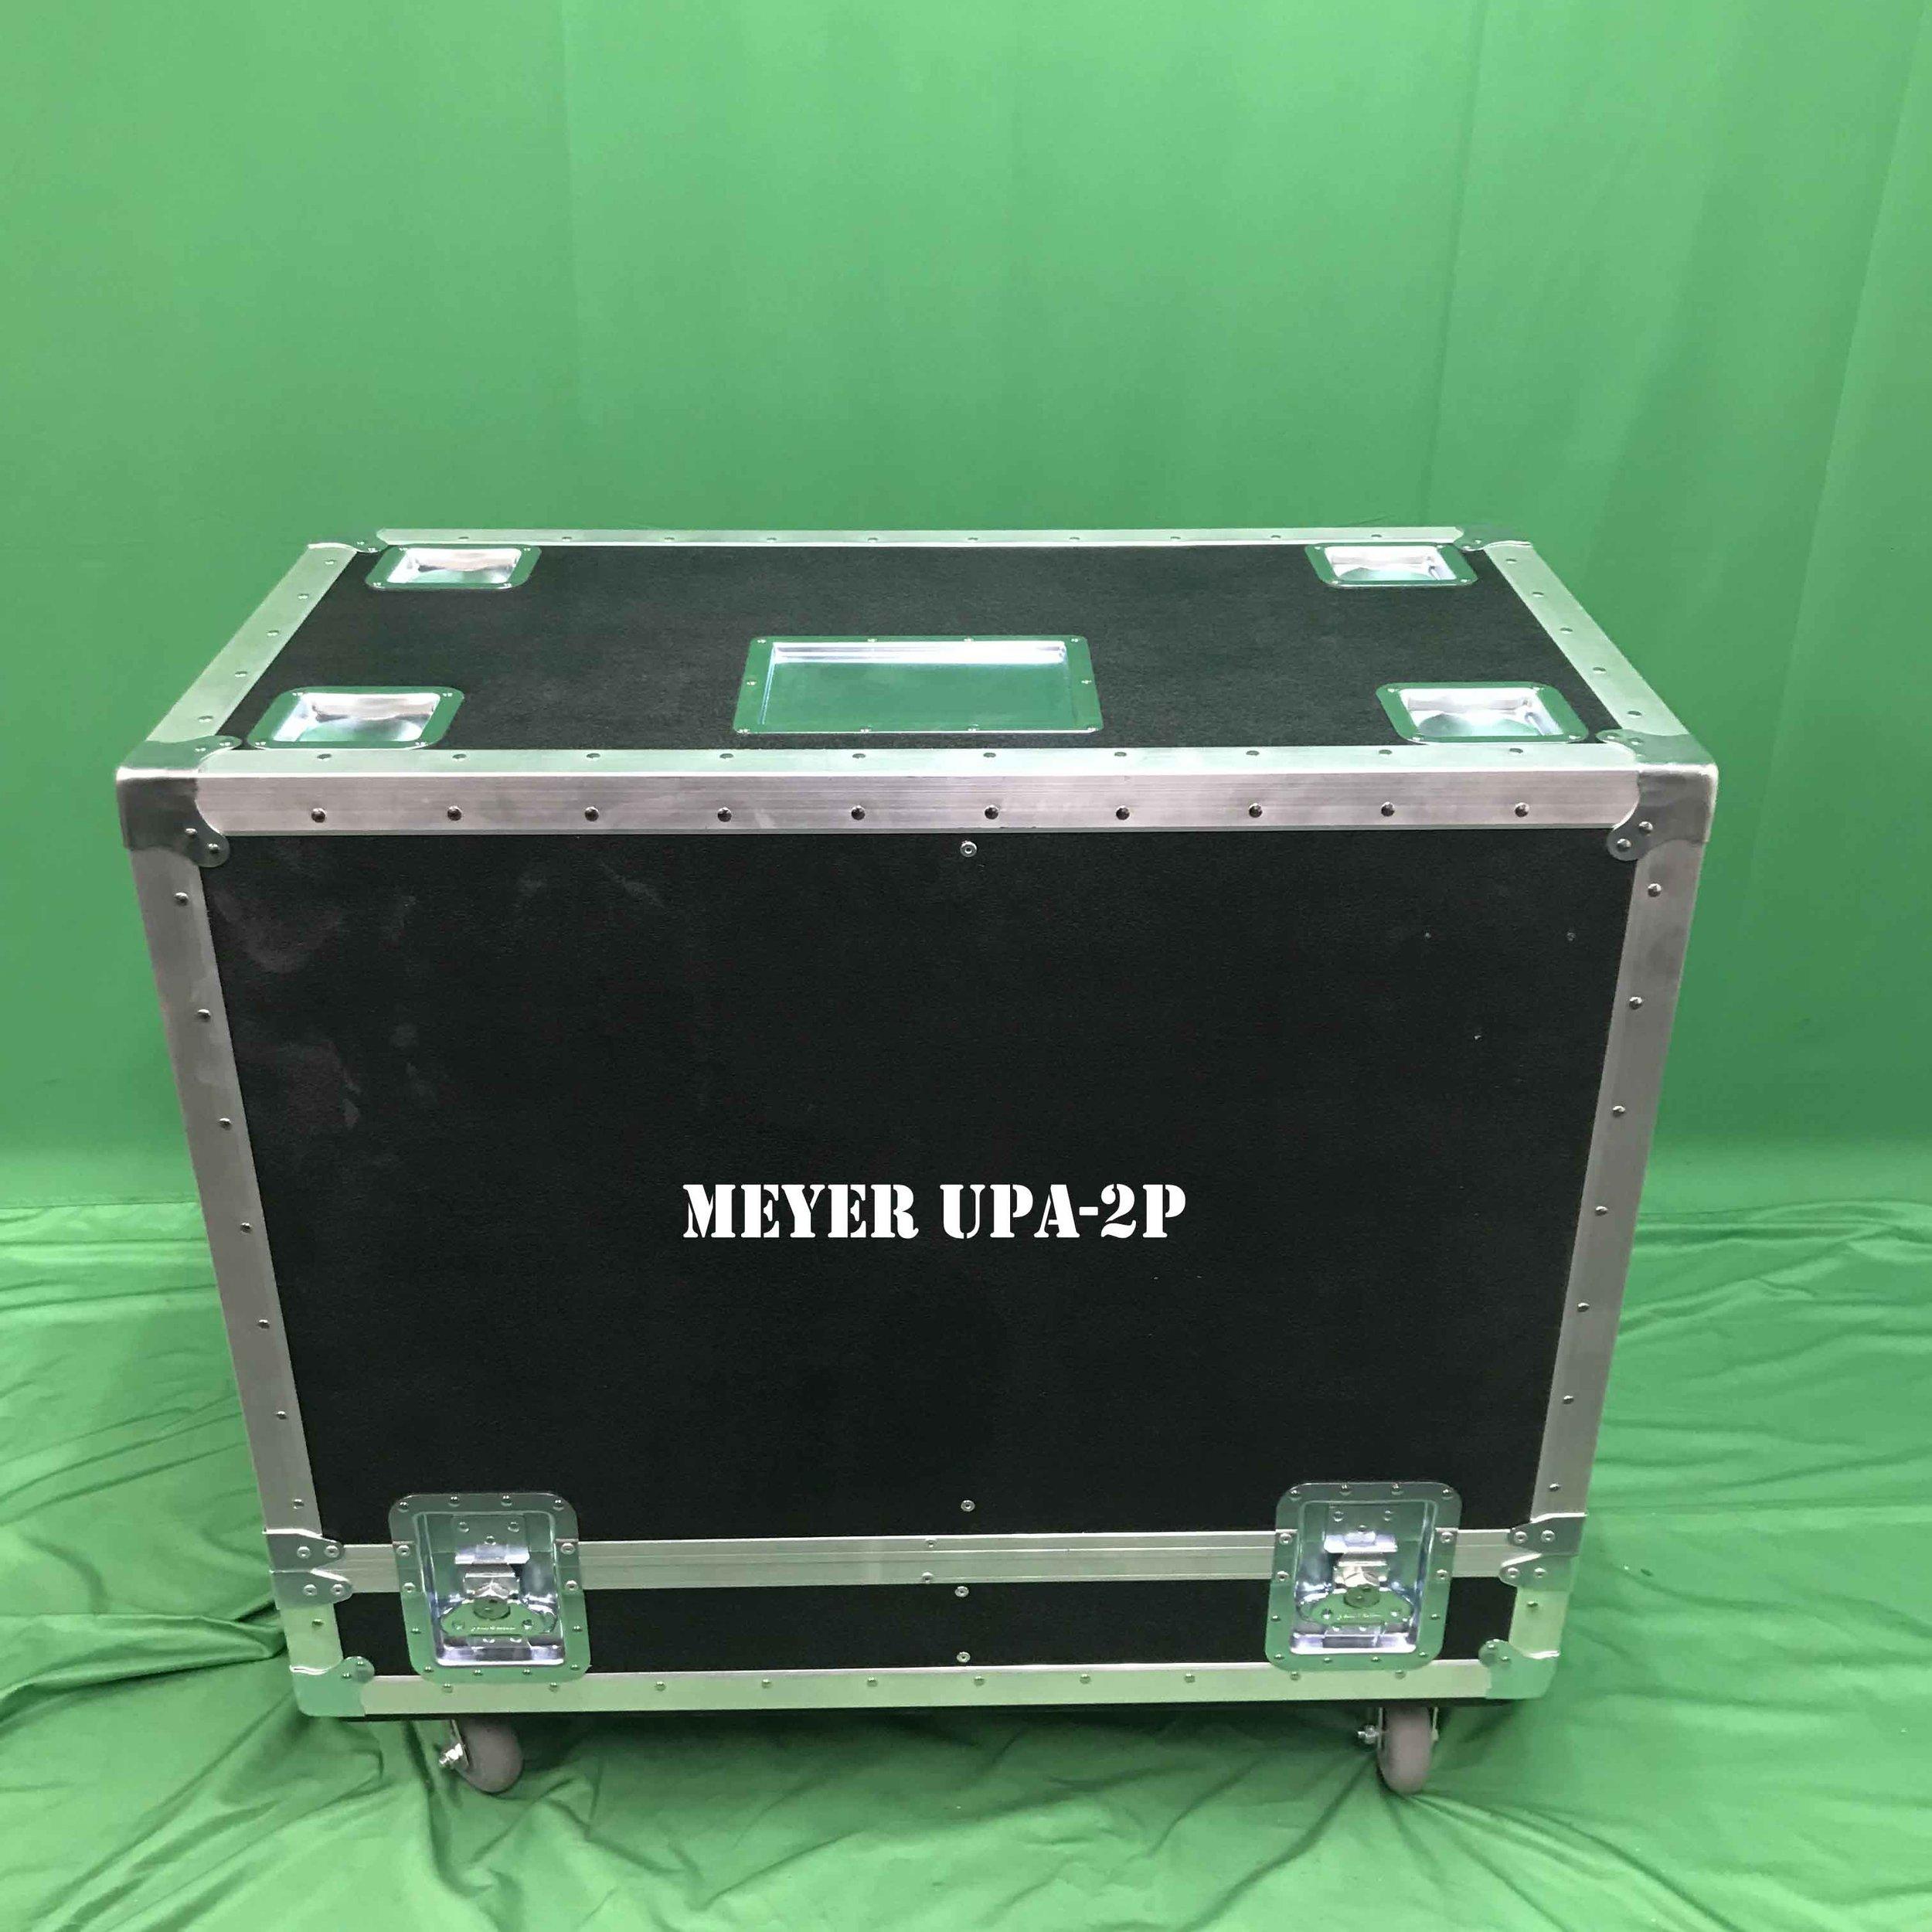 Meyer UPA-2p-1.jpg